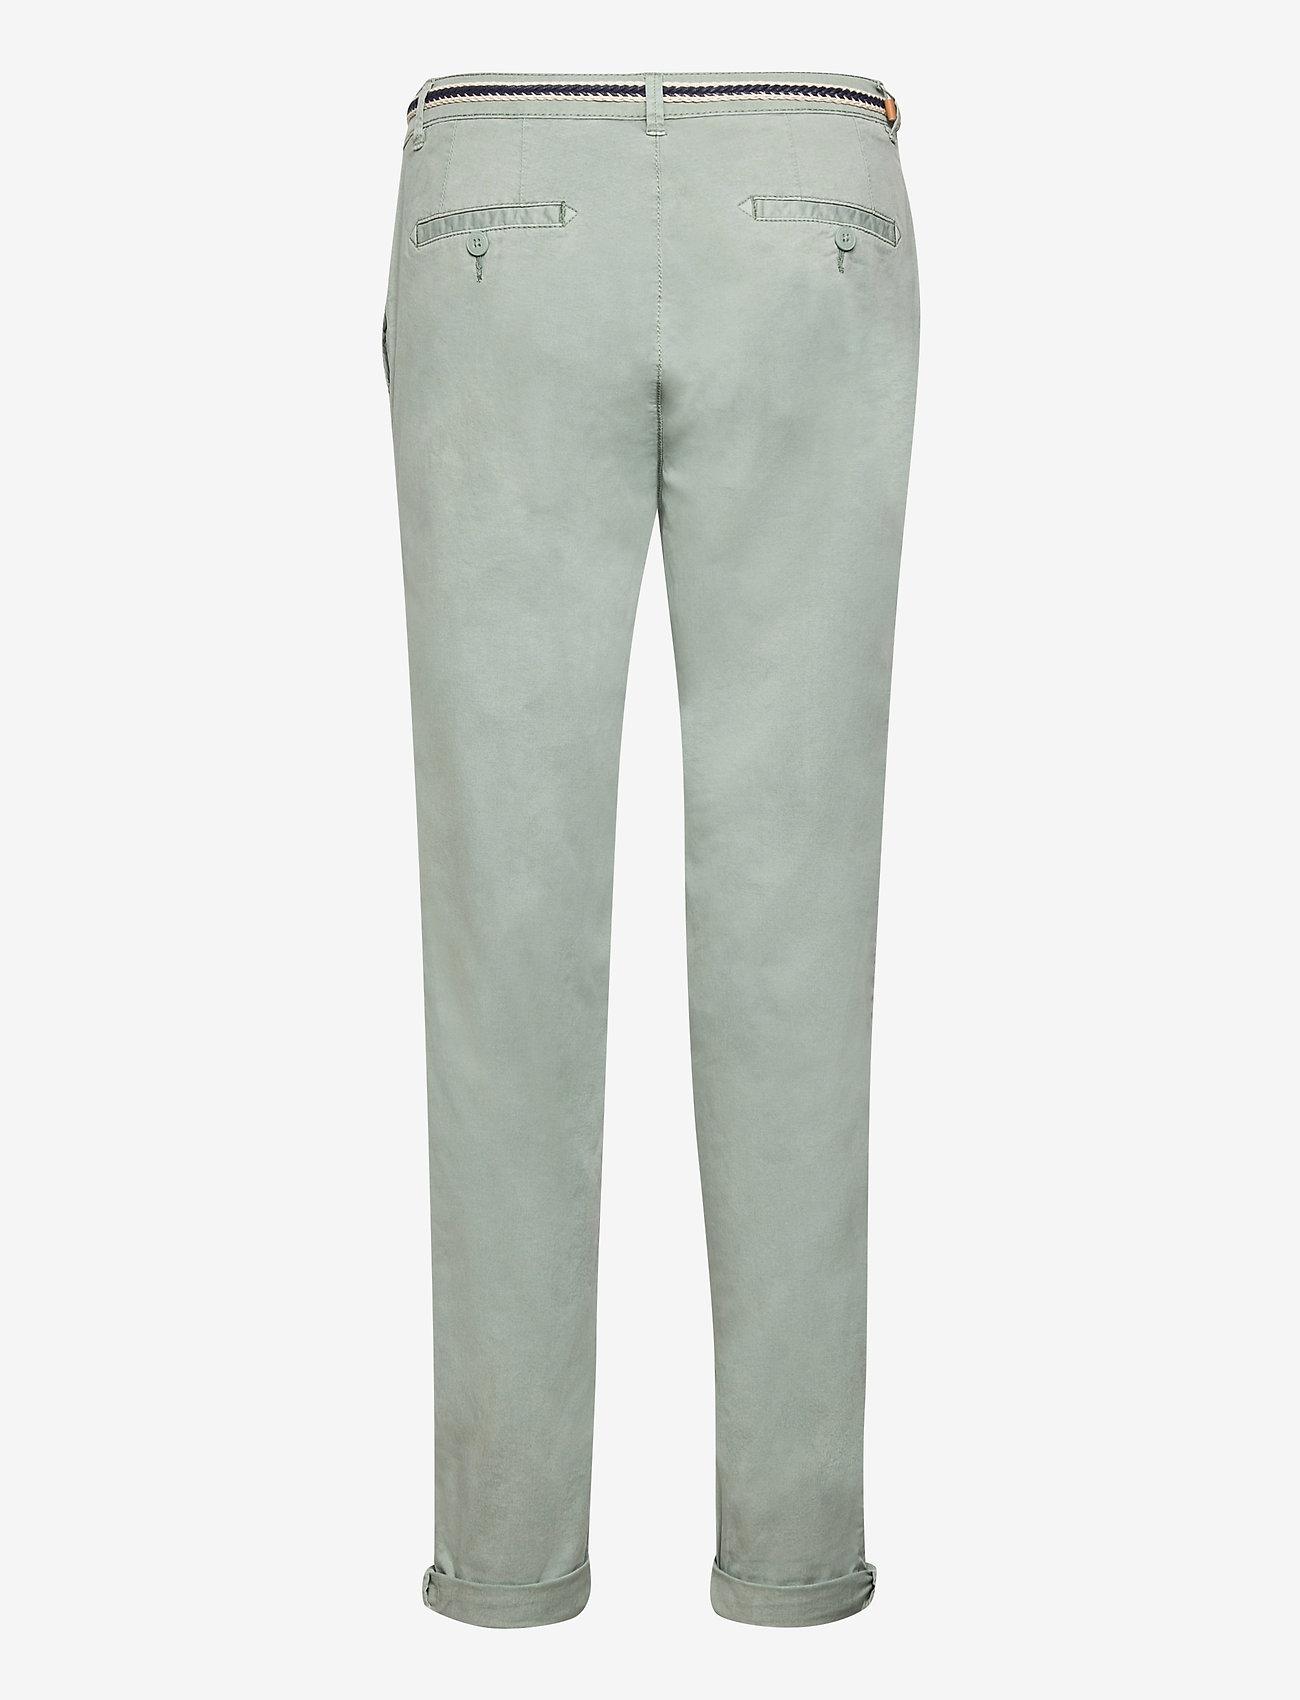 Esprit Casual - Pants woven - chinos - light khaki - 1